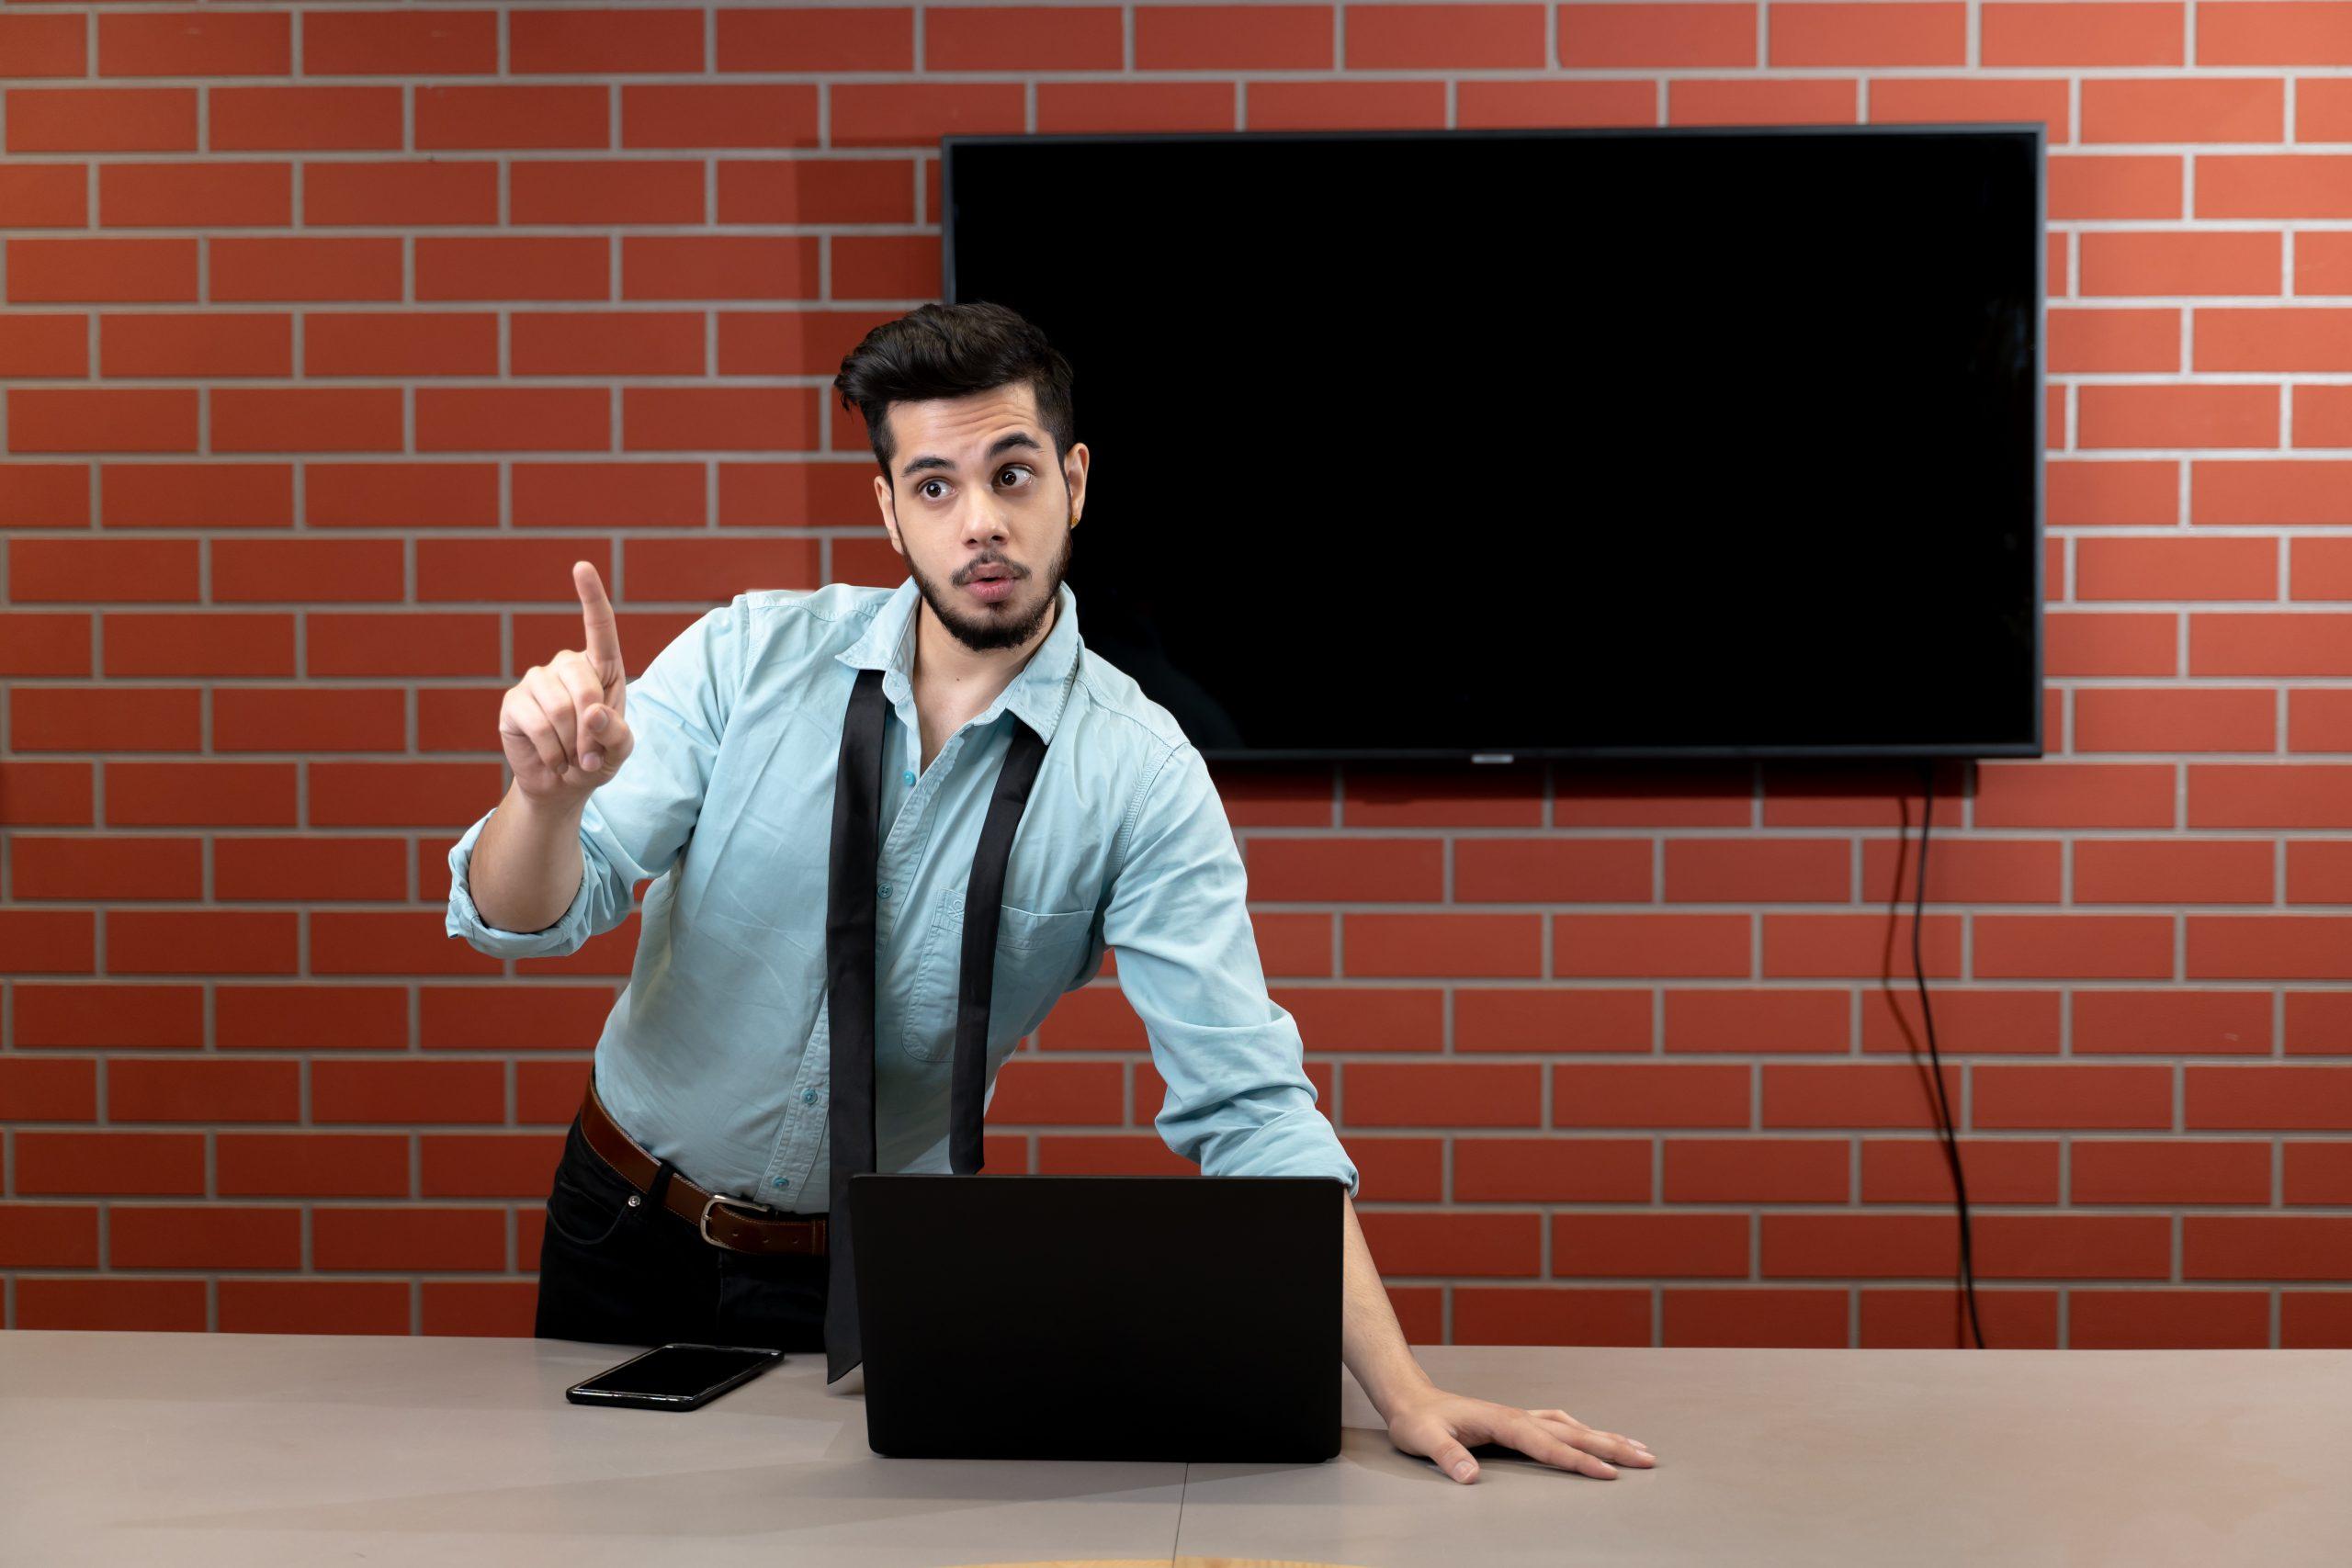 Manager giving presentation